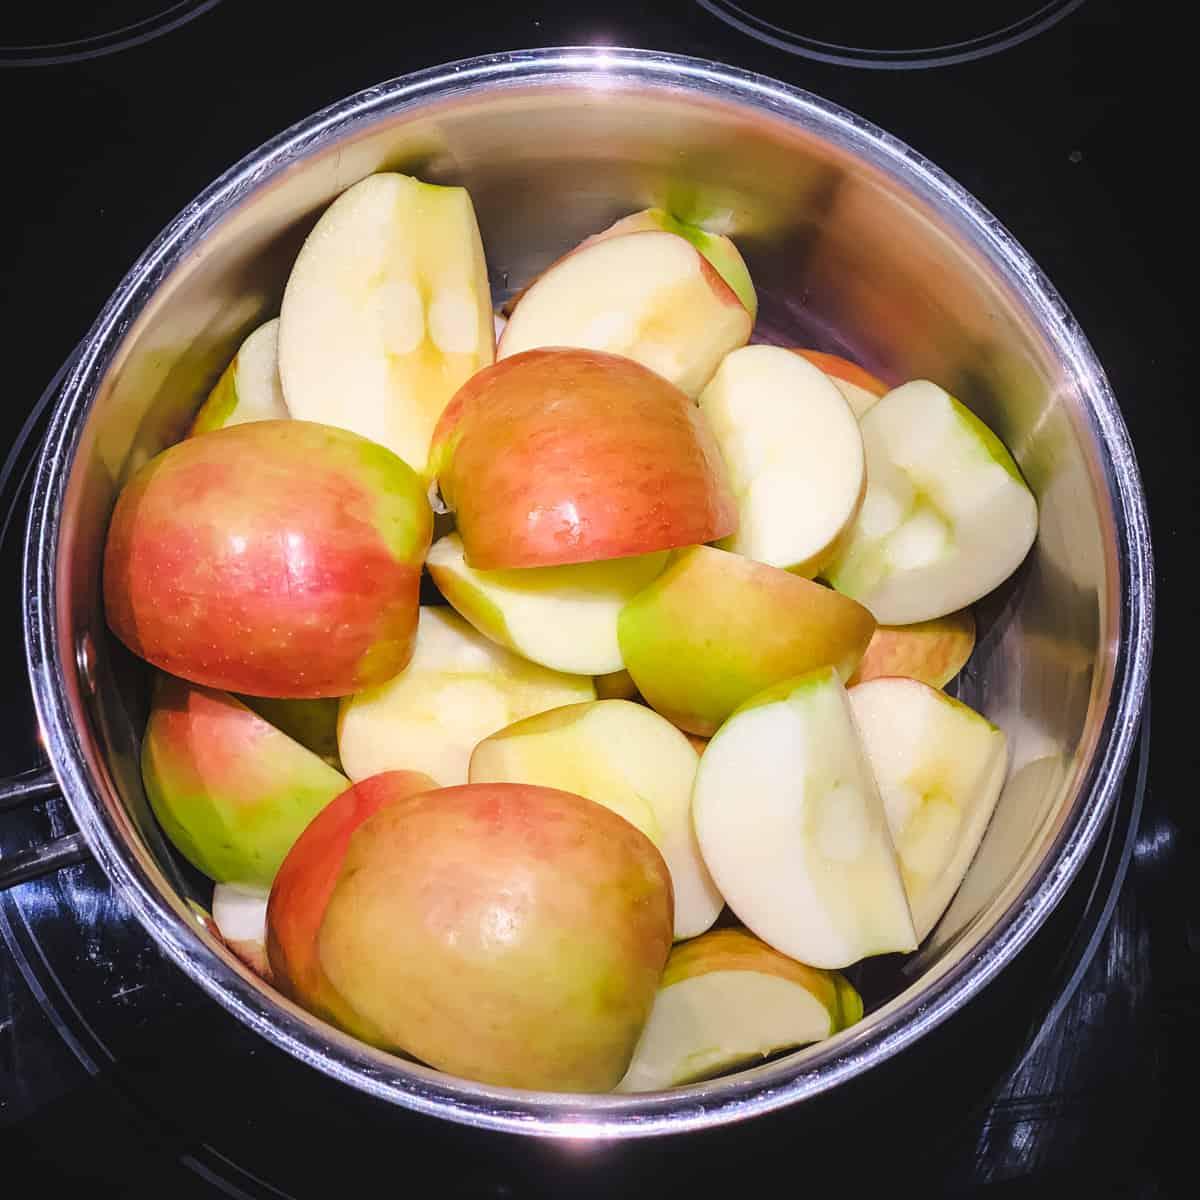 a pot of fresh quartered honeycrisp apples with the skins on